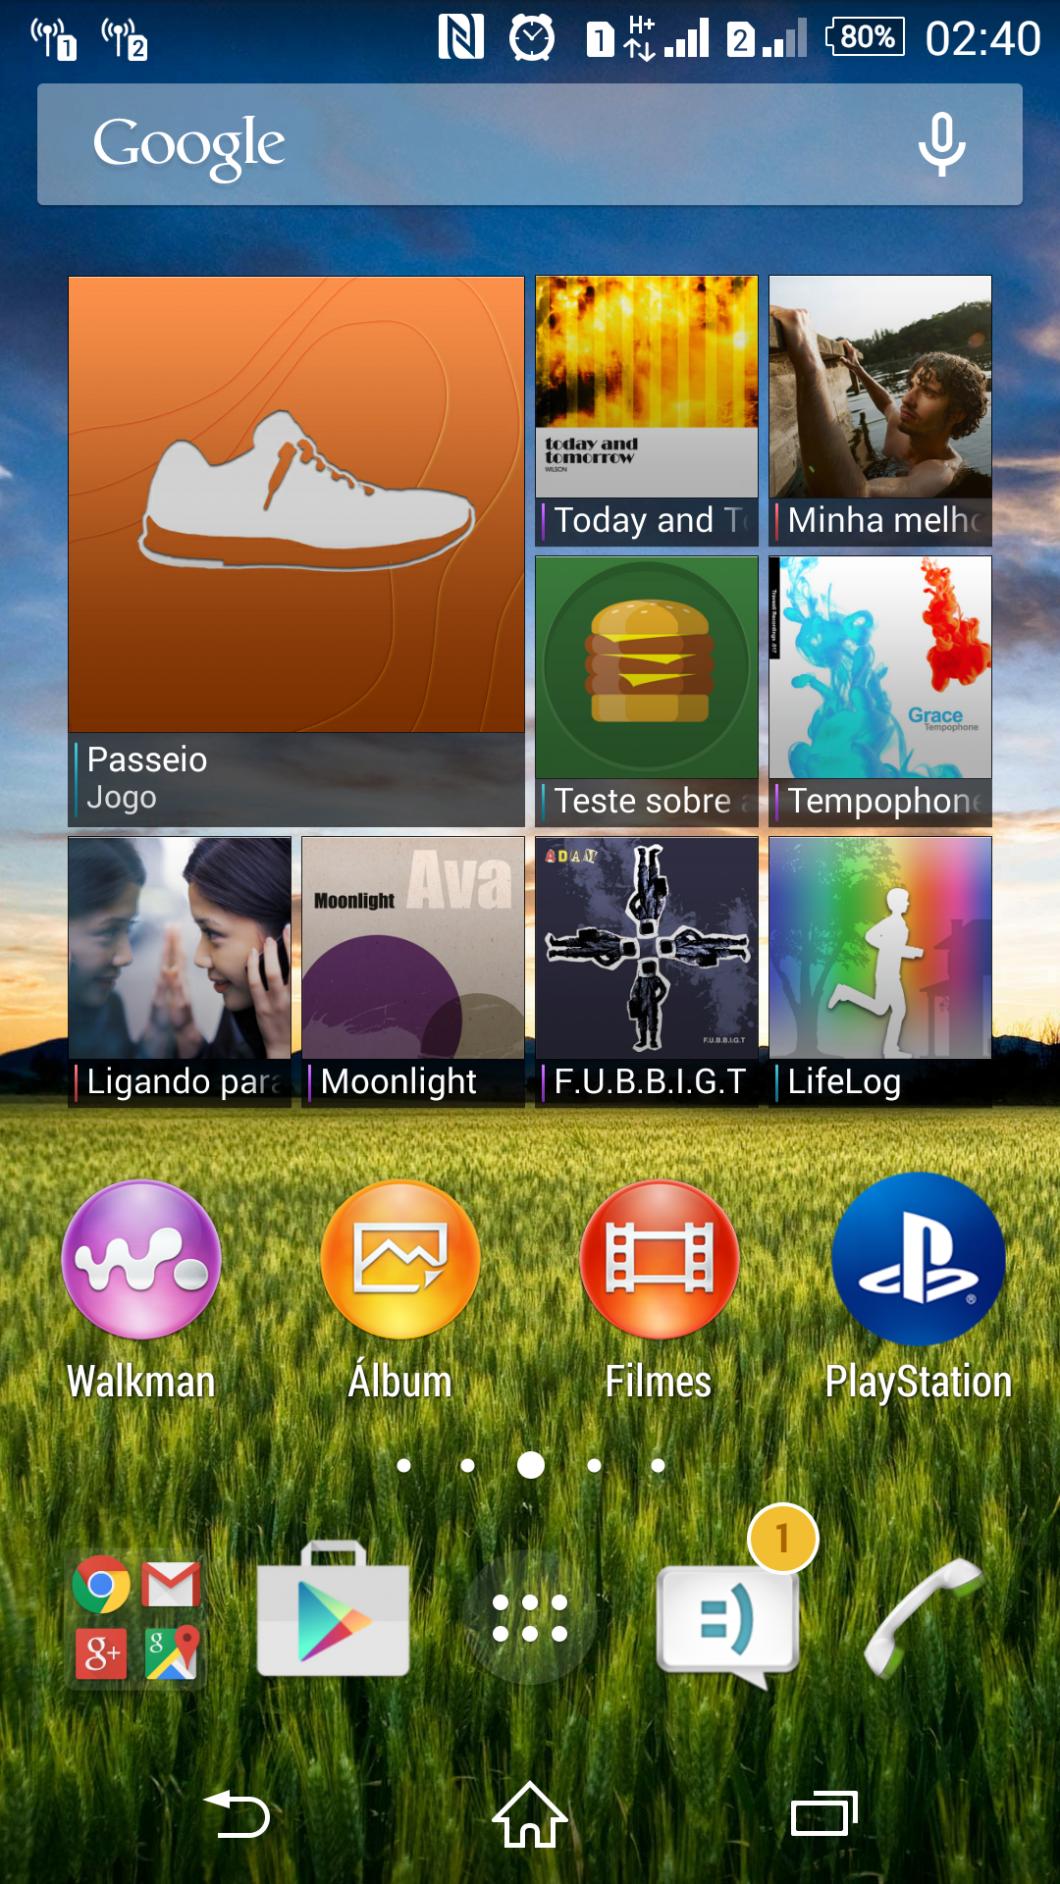 Screenshot_2014-11-15-02-40-26